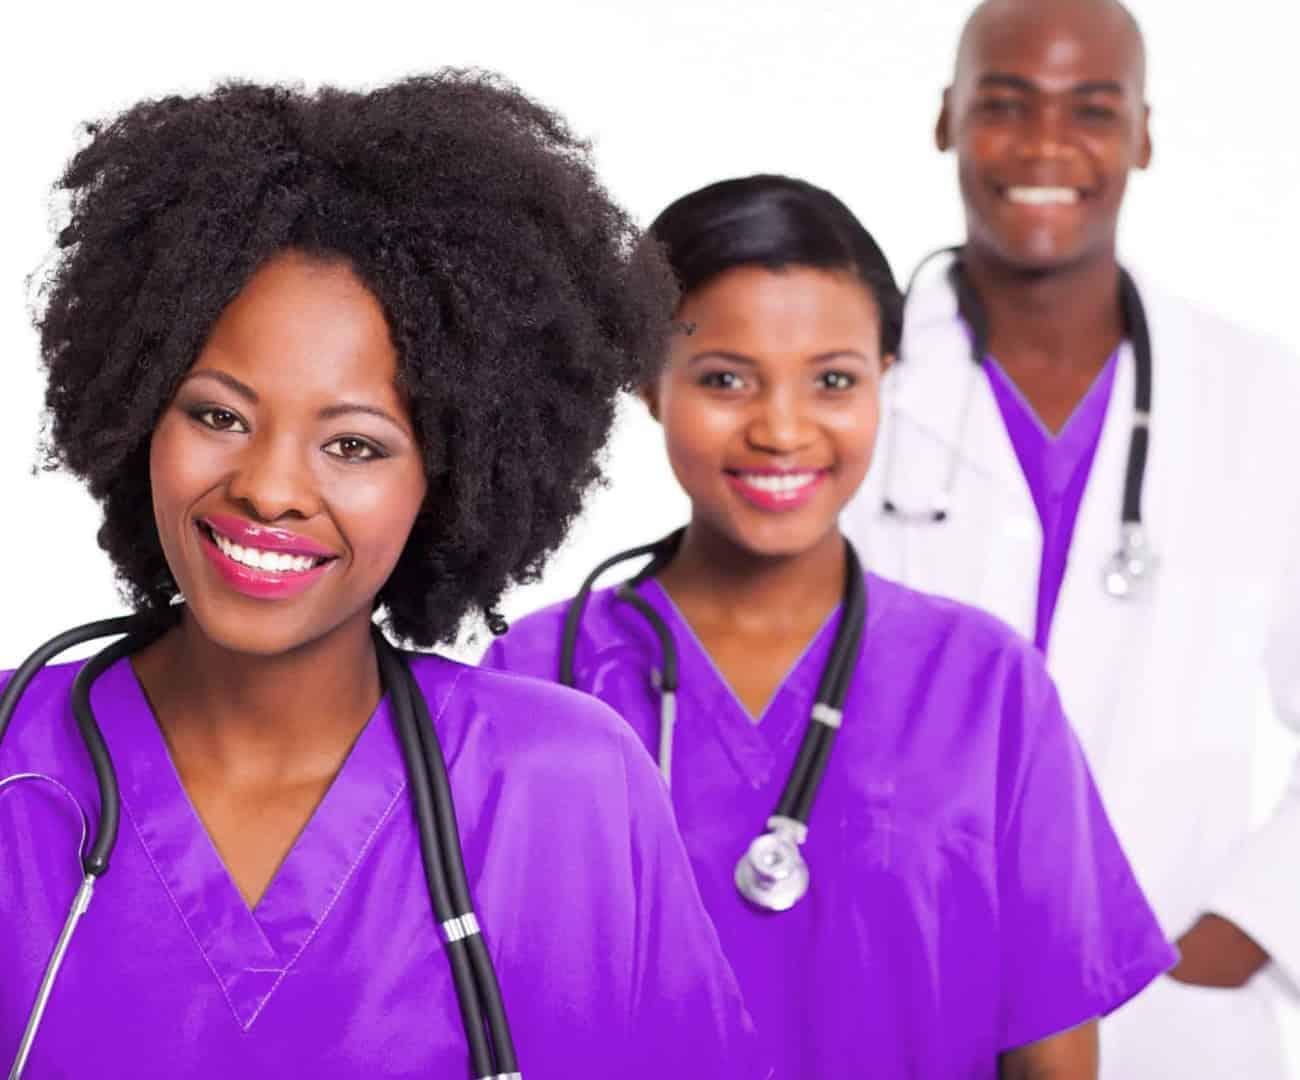 Veterinary-Medicine-Students -1